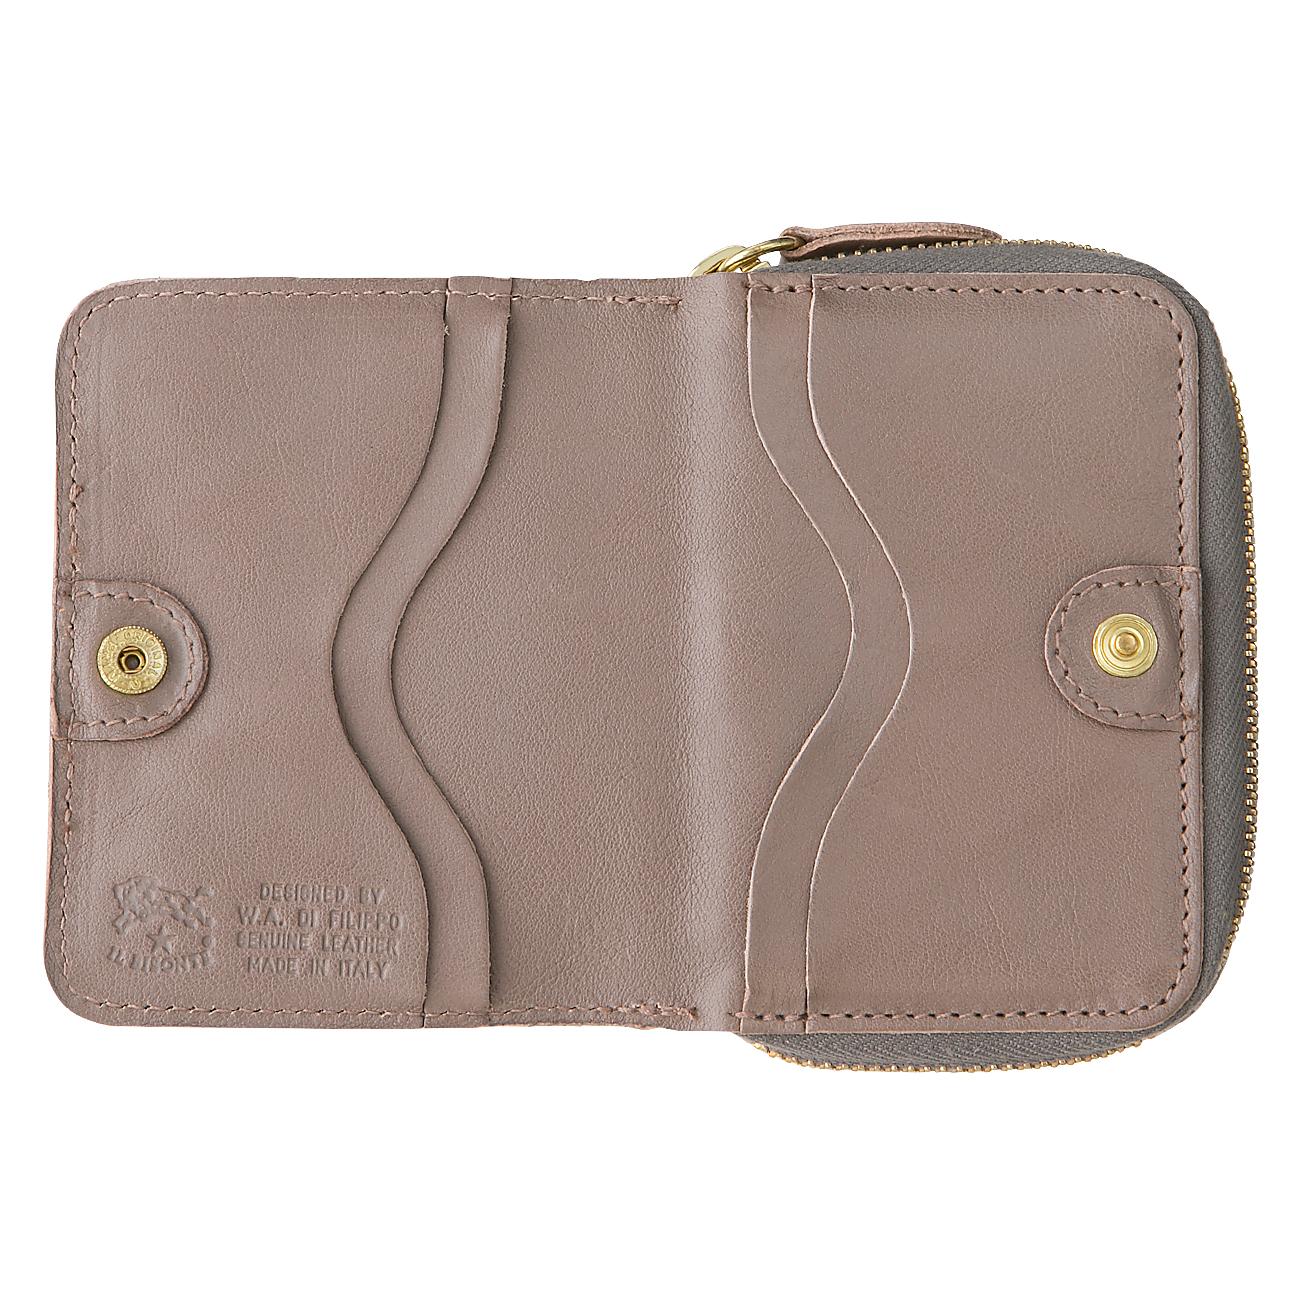 IL BISONTE (イル ビゾンテ) 日本公式オンラインストア 2つ折財布 54182304190